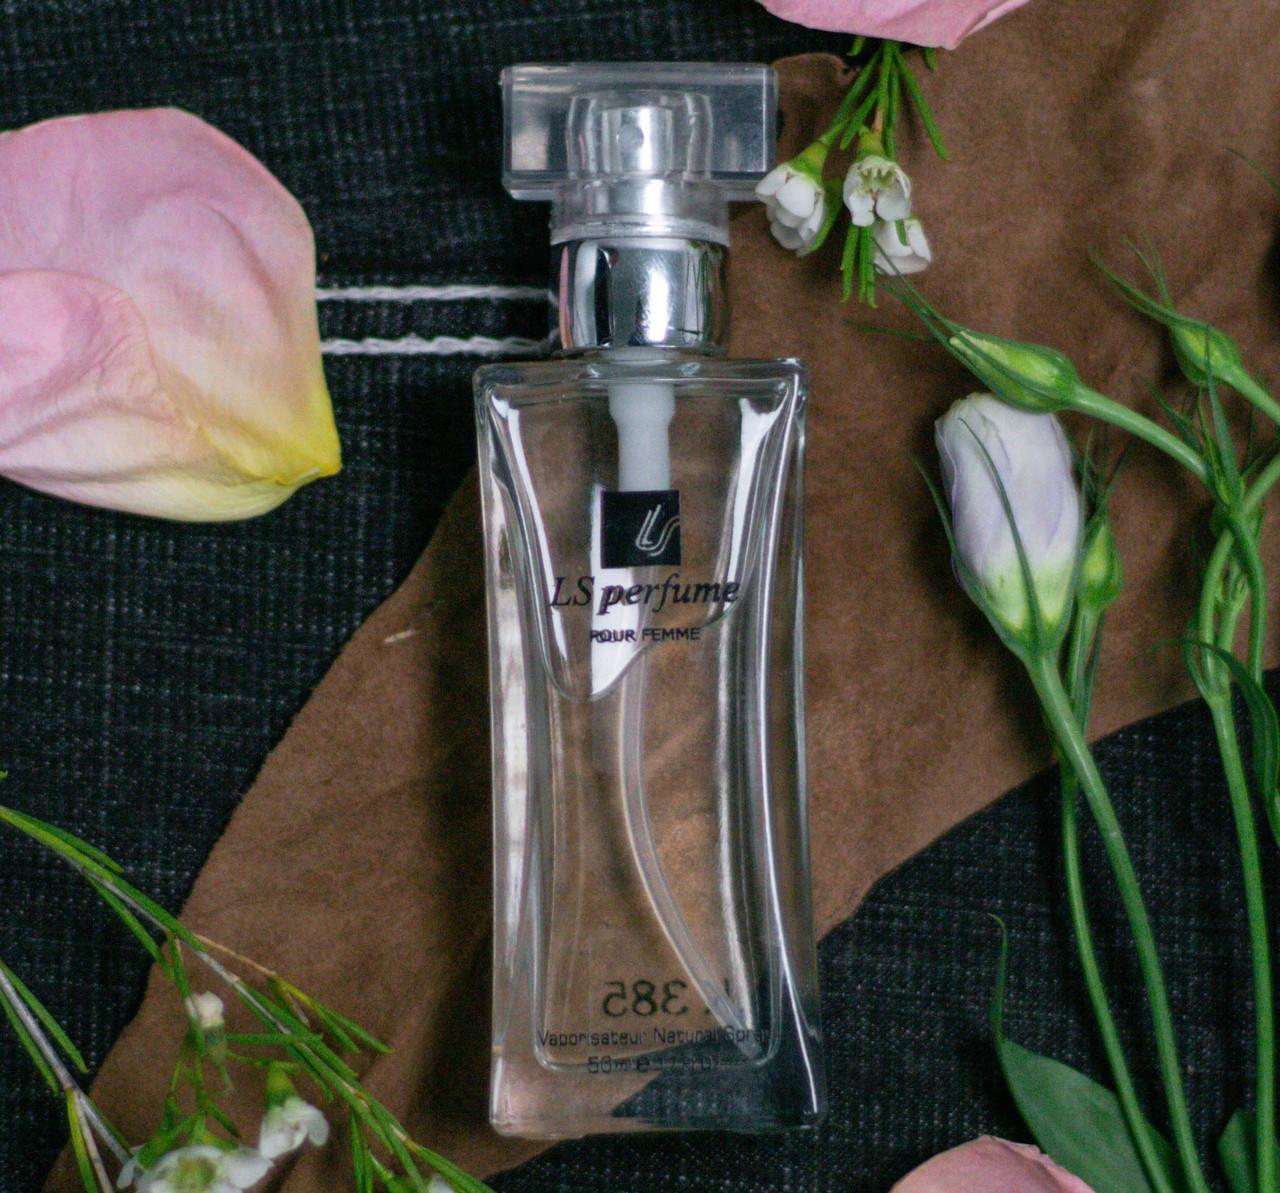 K385 по мотивам Beautiful belle, Estee Lauder, 50ml